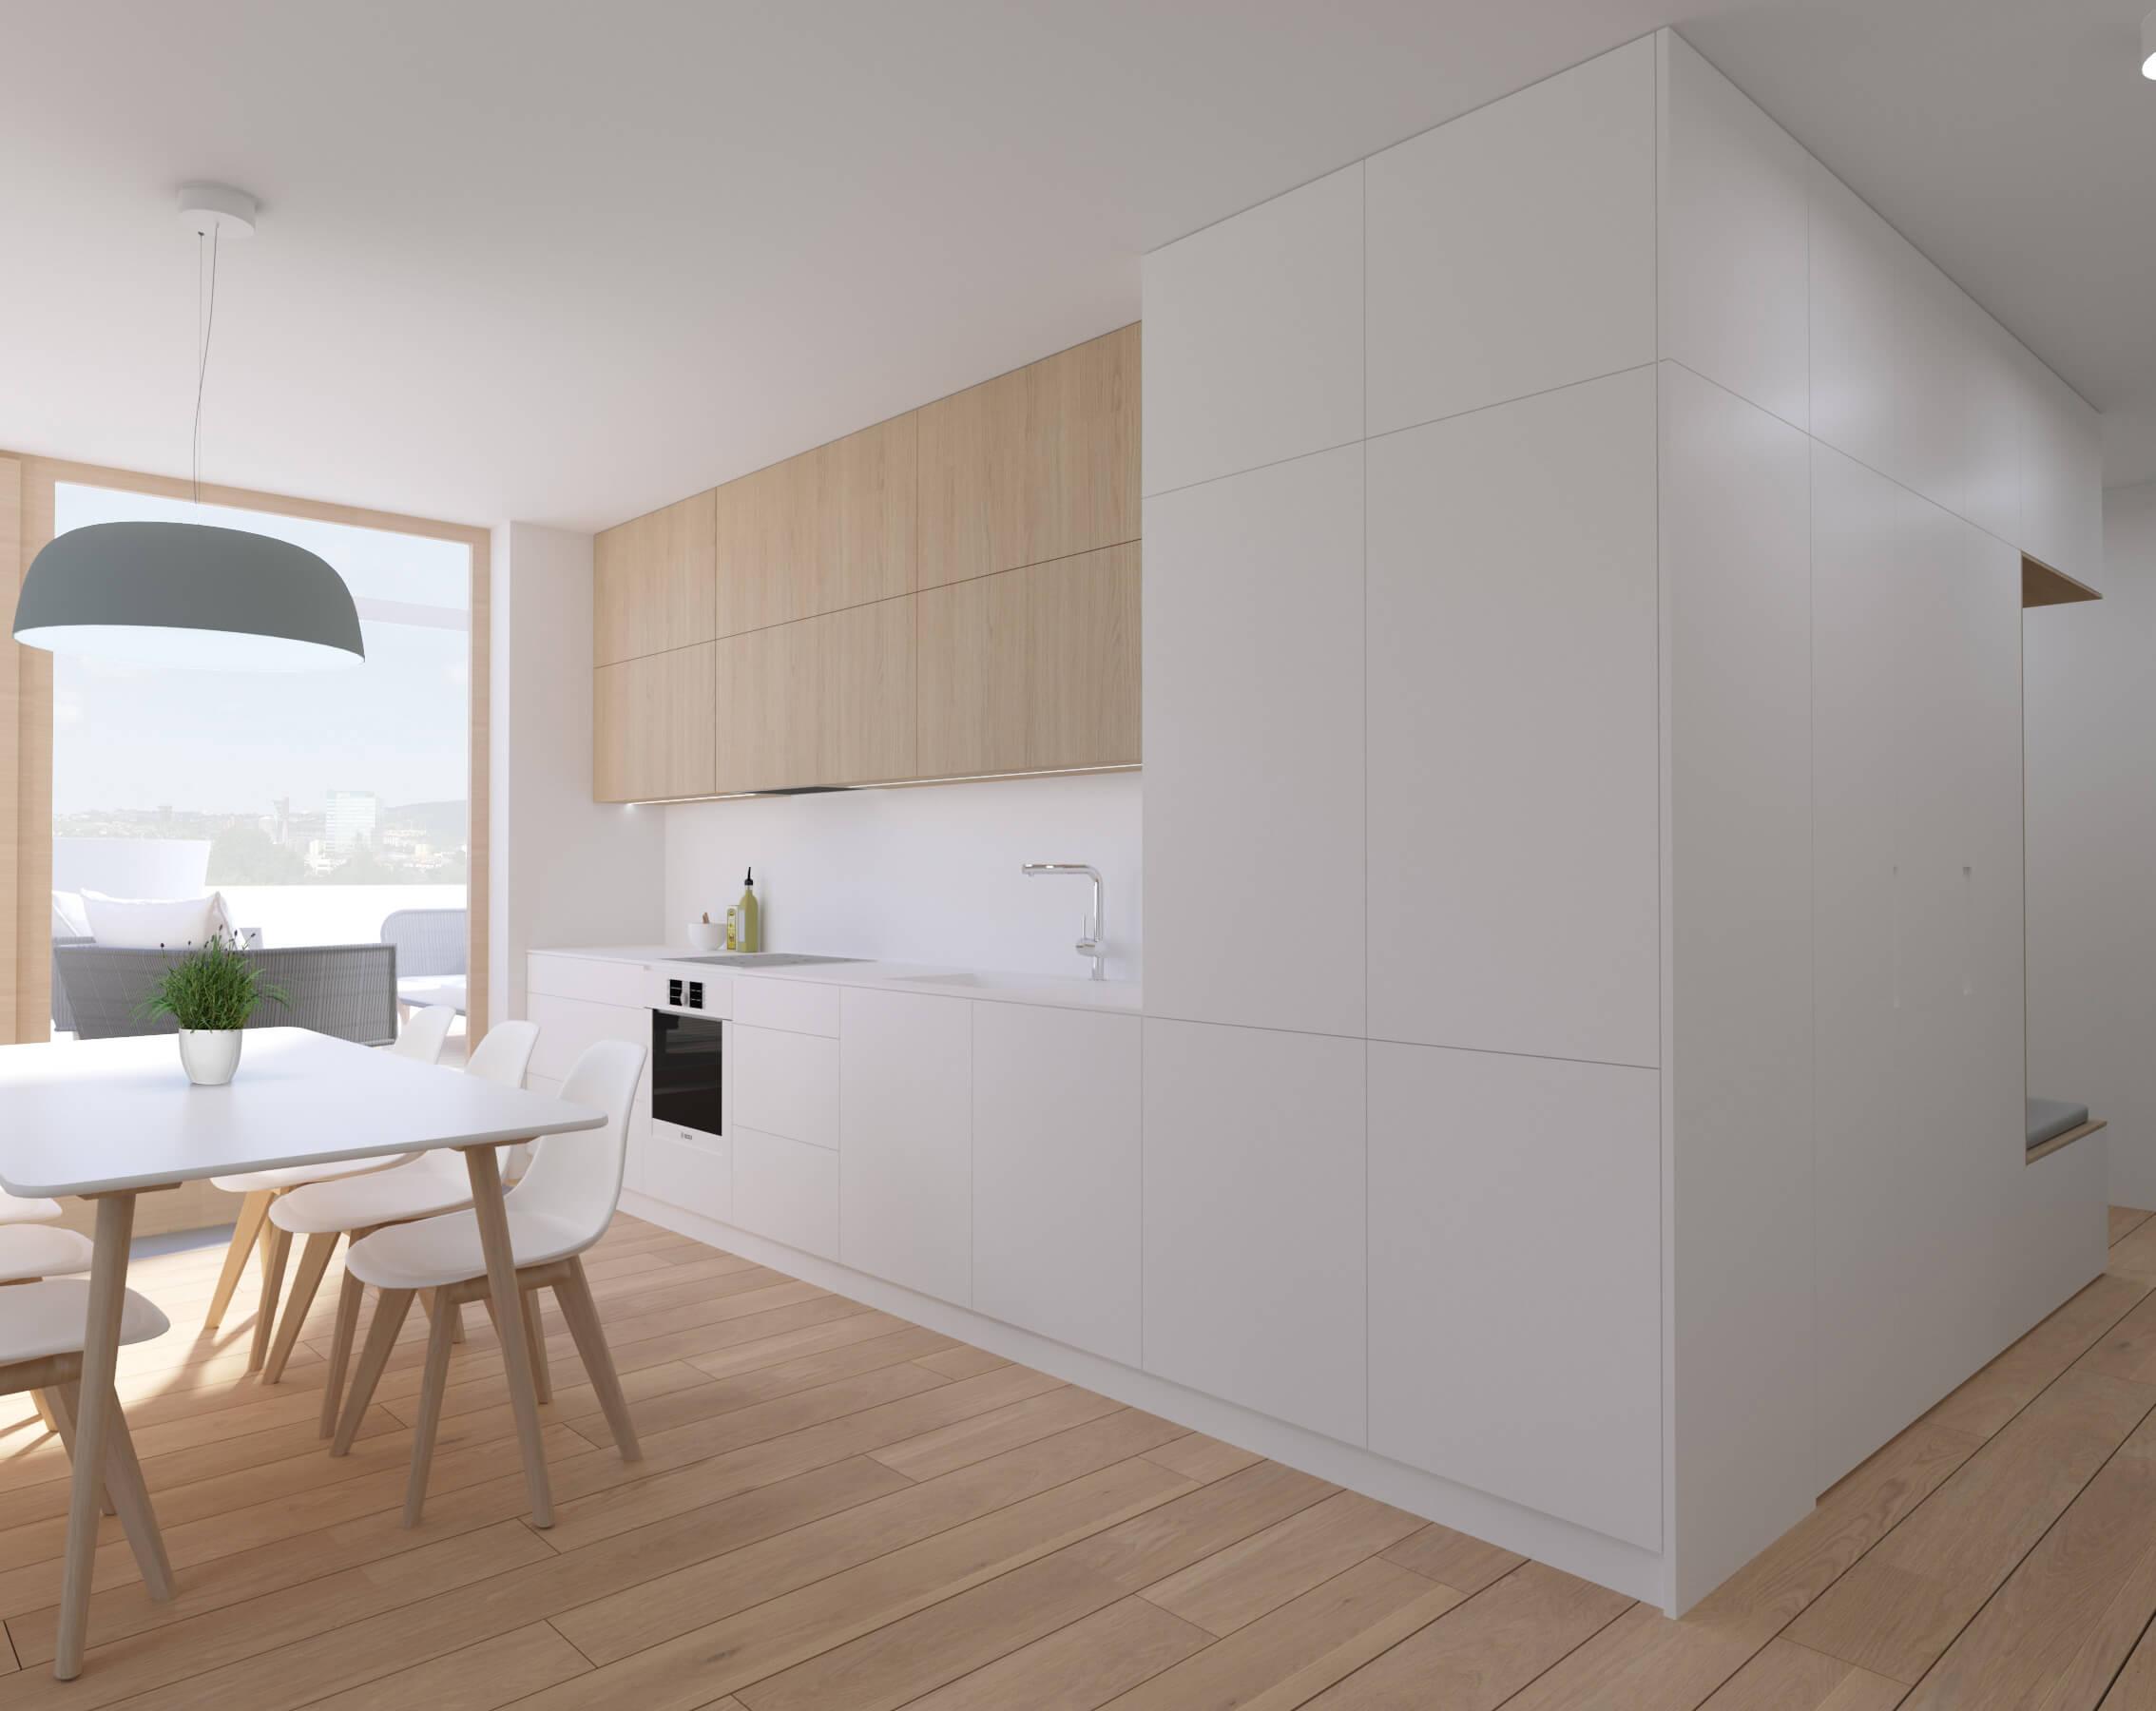 interierovy dizajn kuchyne - bratislava, byty Nido